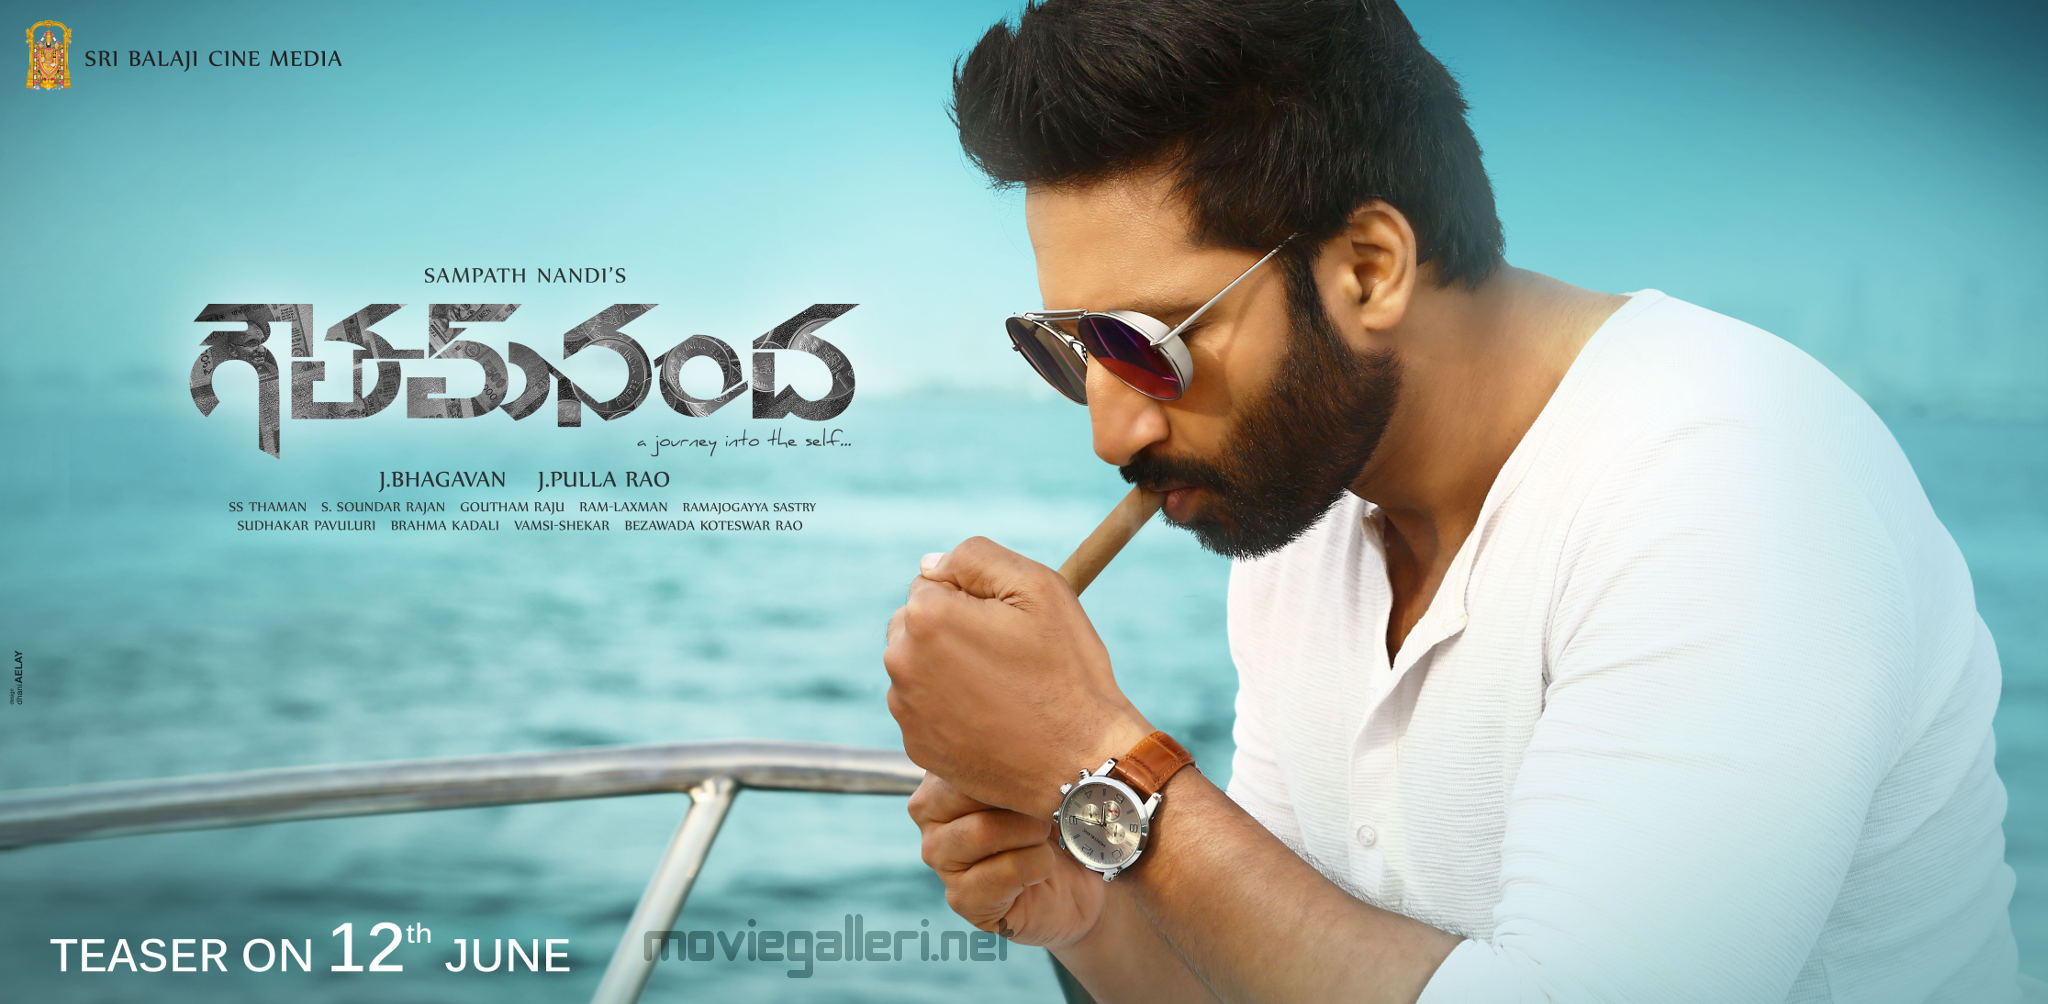 Gopichand Gautam Nanda Movie Teaser Release Date June 12th Wallpaper